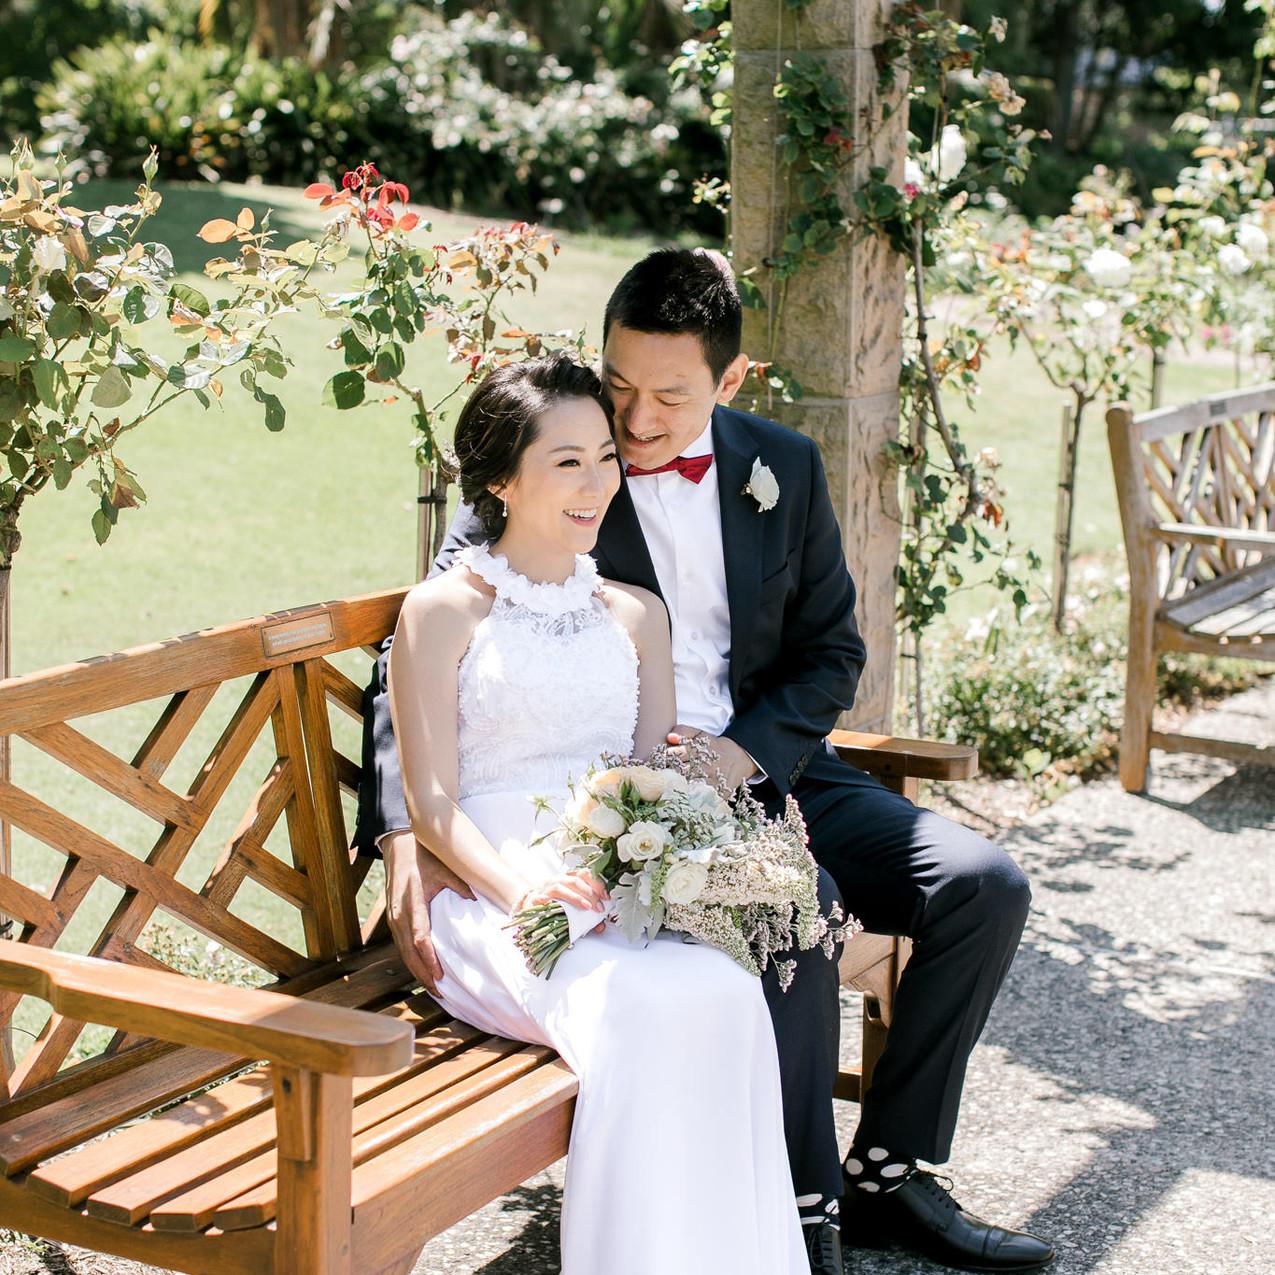 Asian Wedding Makeup Artist Photography: Clarzzique